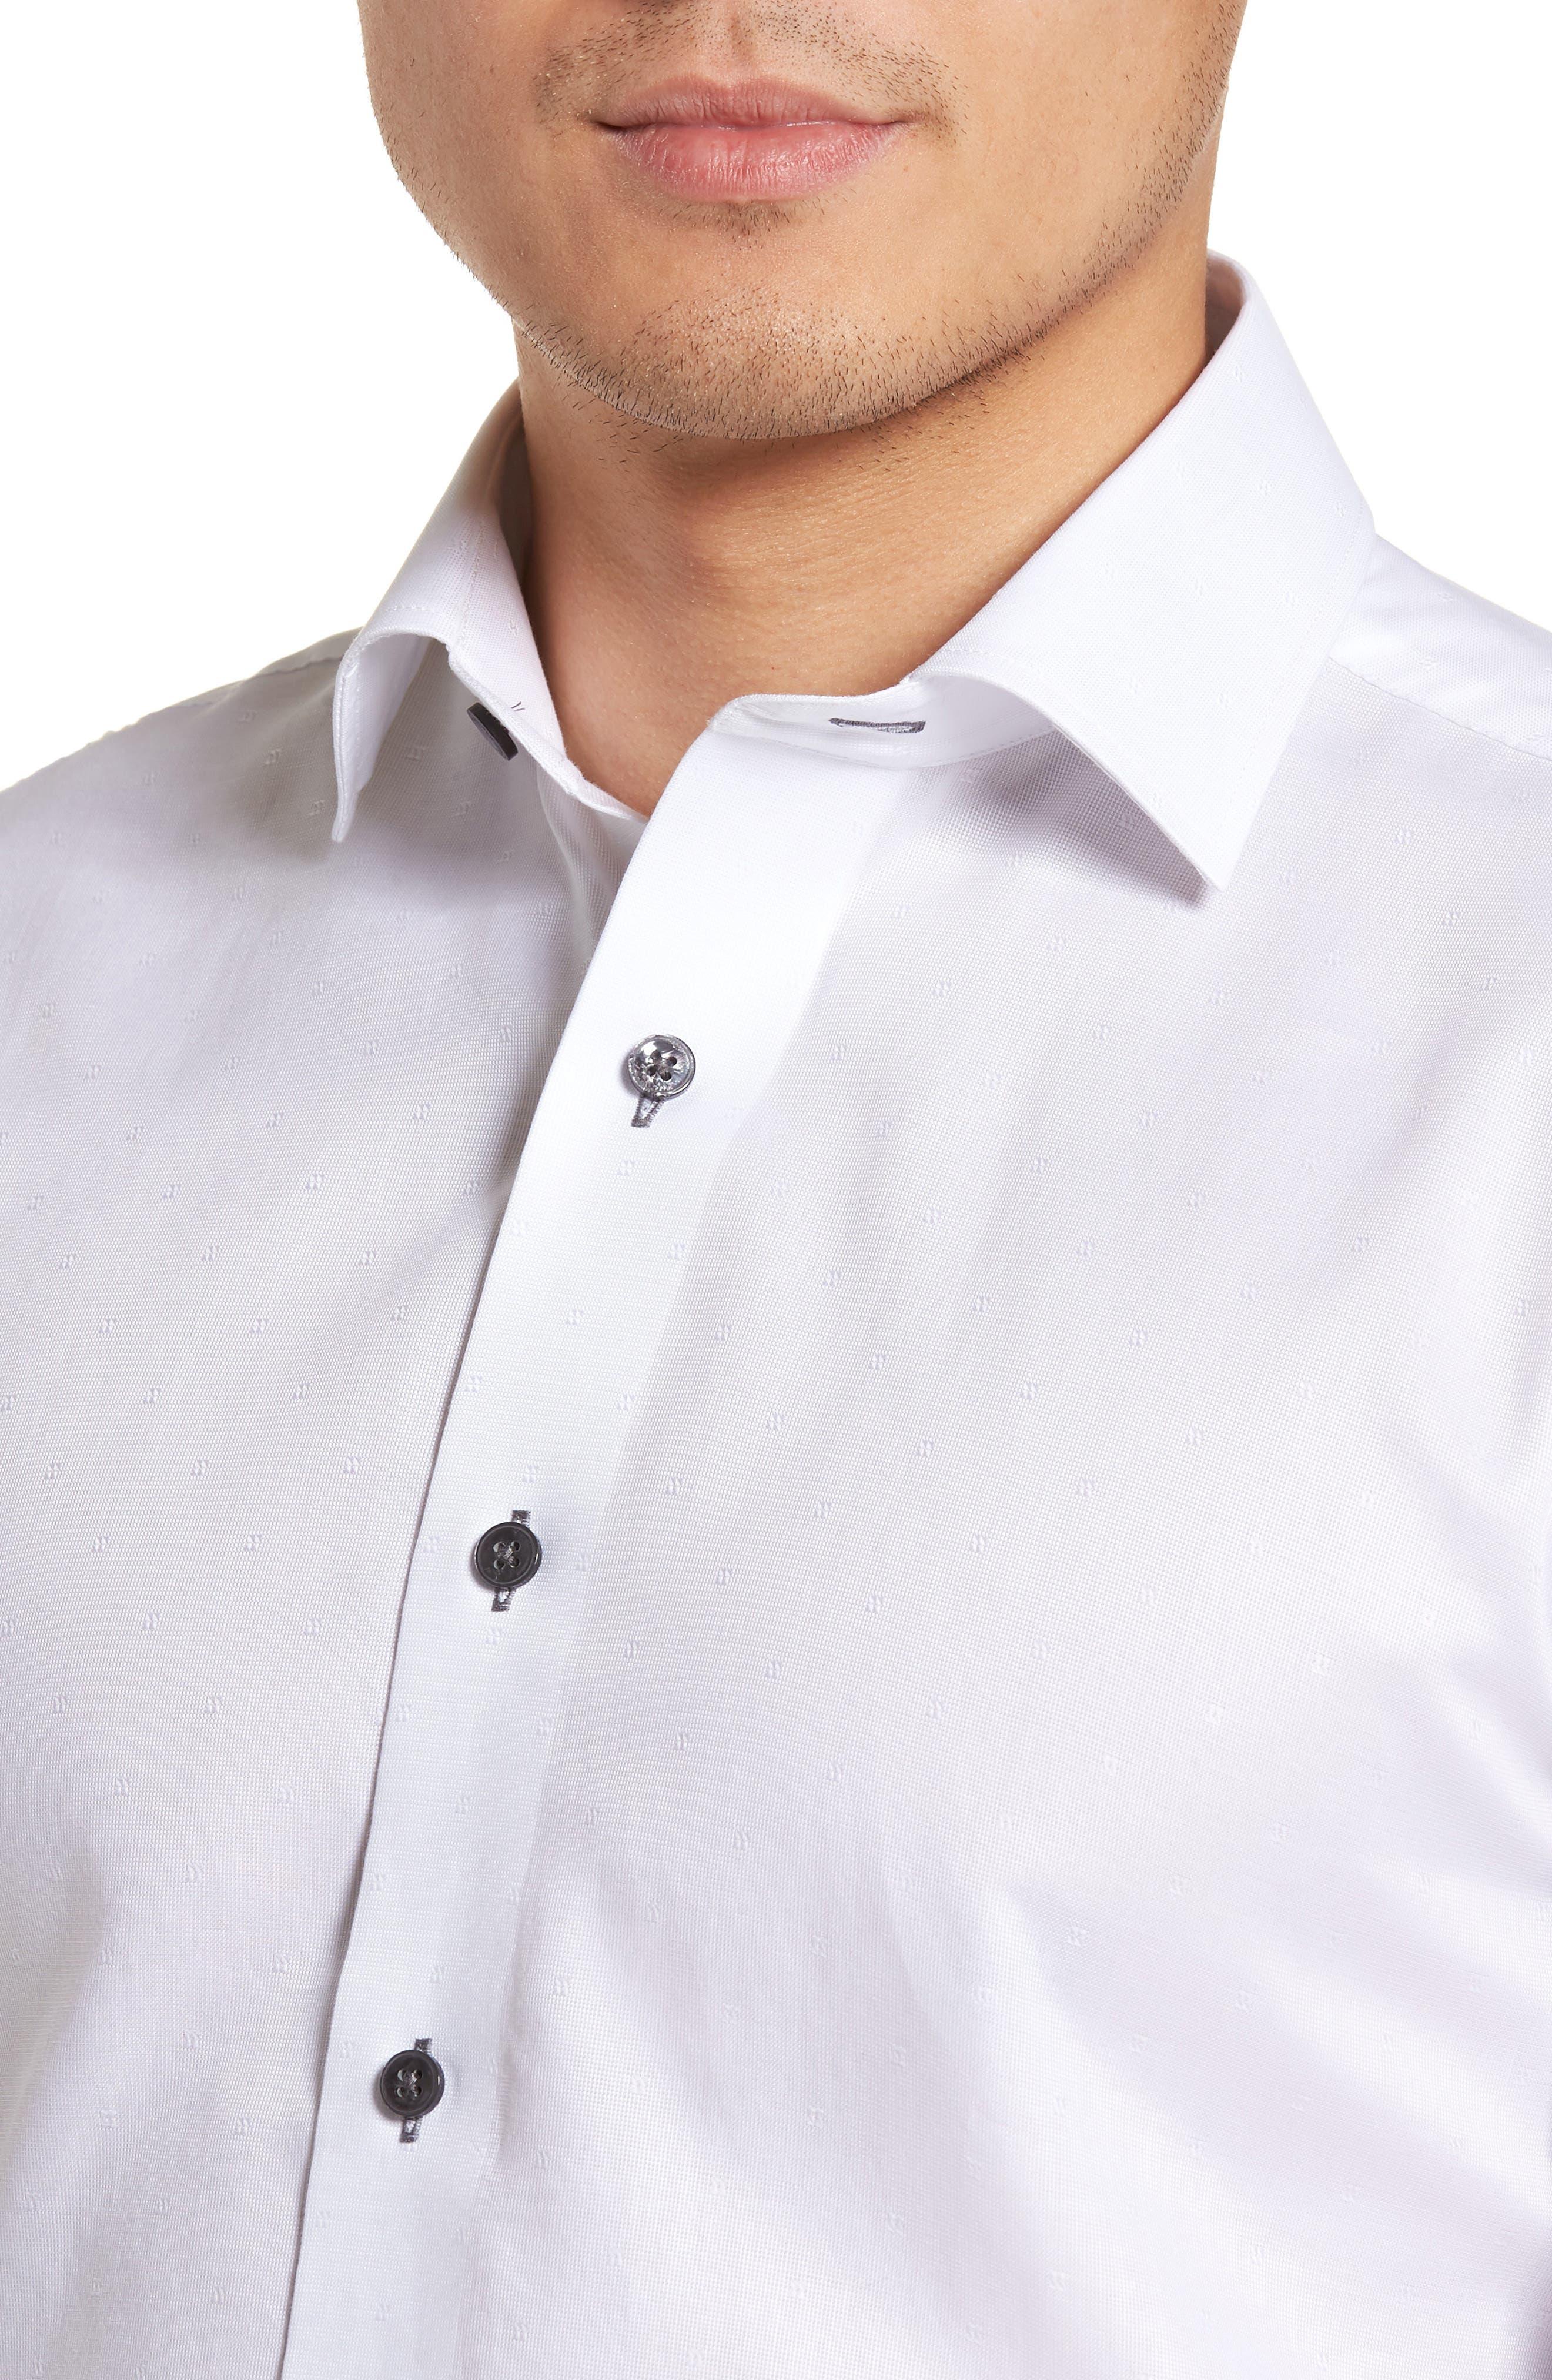 Trim Fit Textured Dress Shirt,                             Alternate thumbnail 2, color,                             White